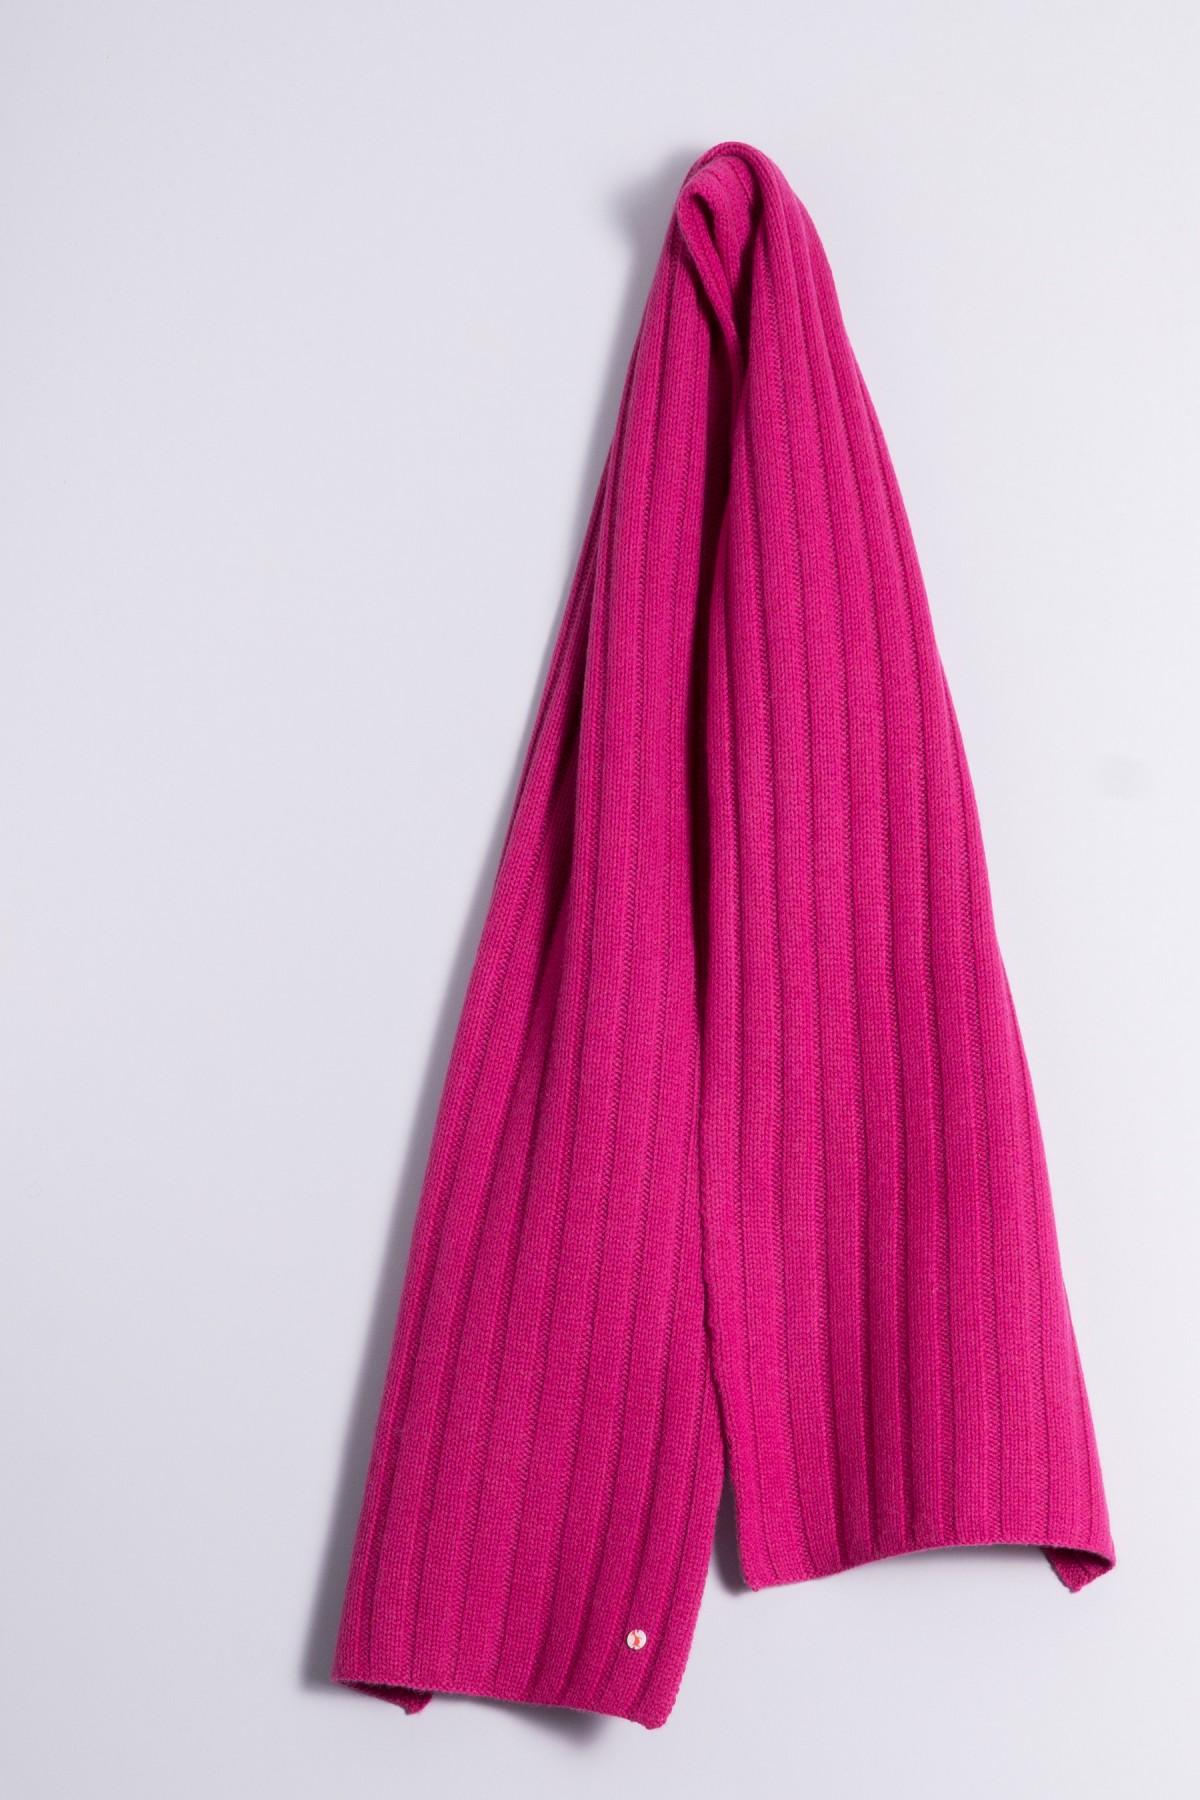 Cable Stitch Shawl 100% Cashmere raspberry